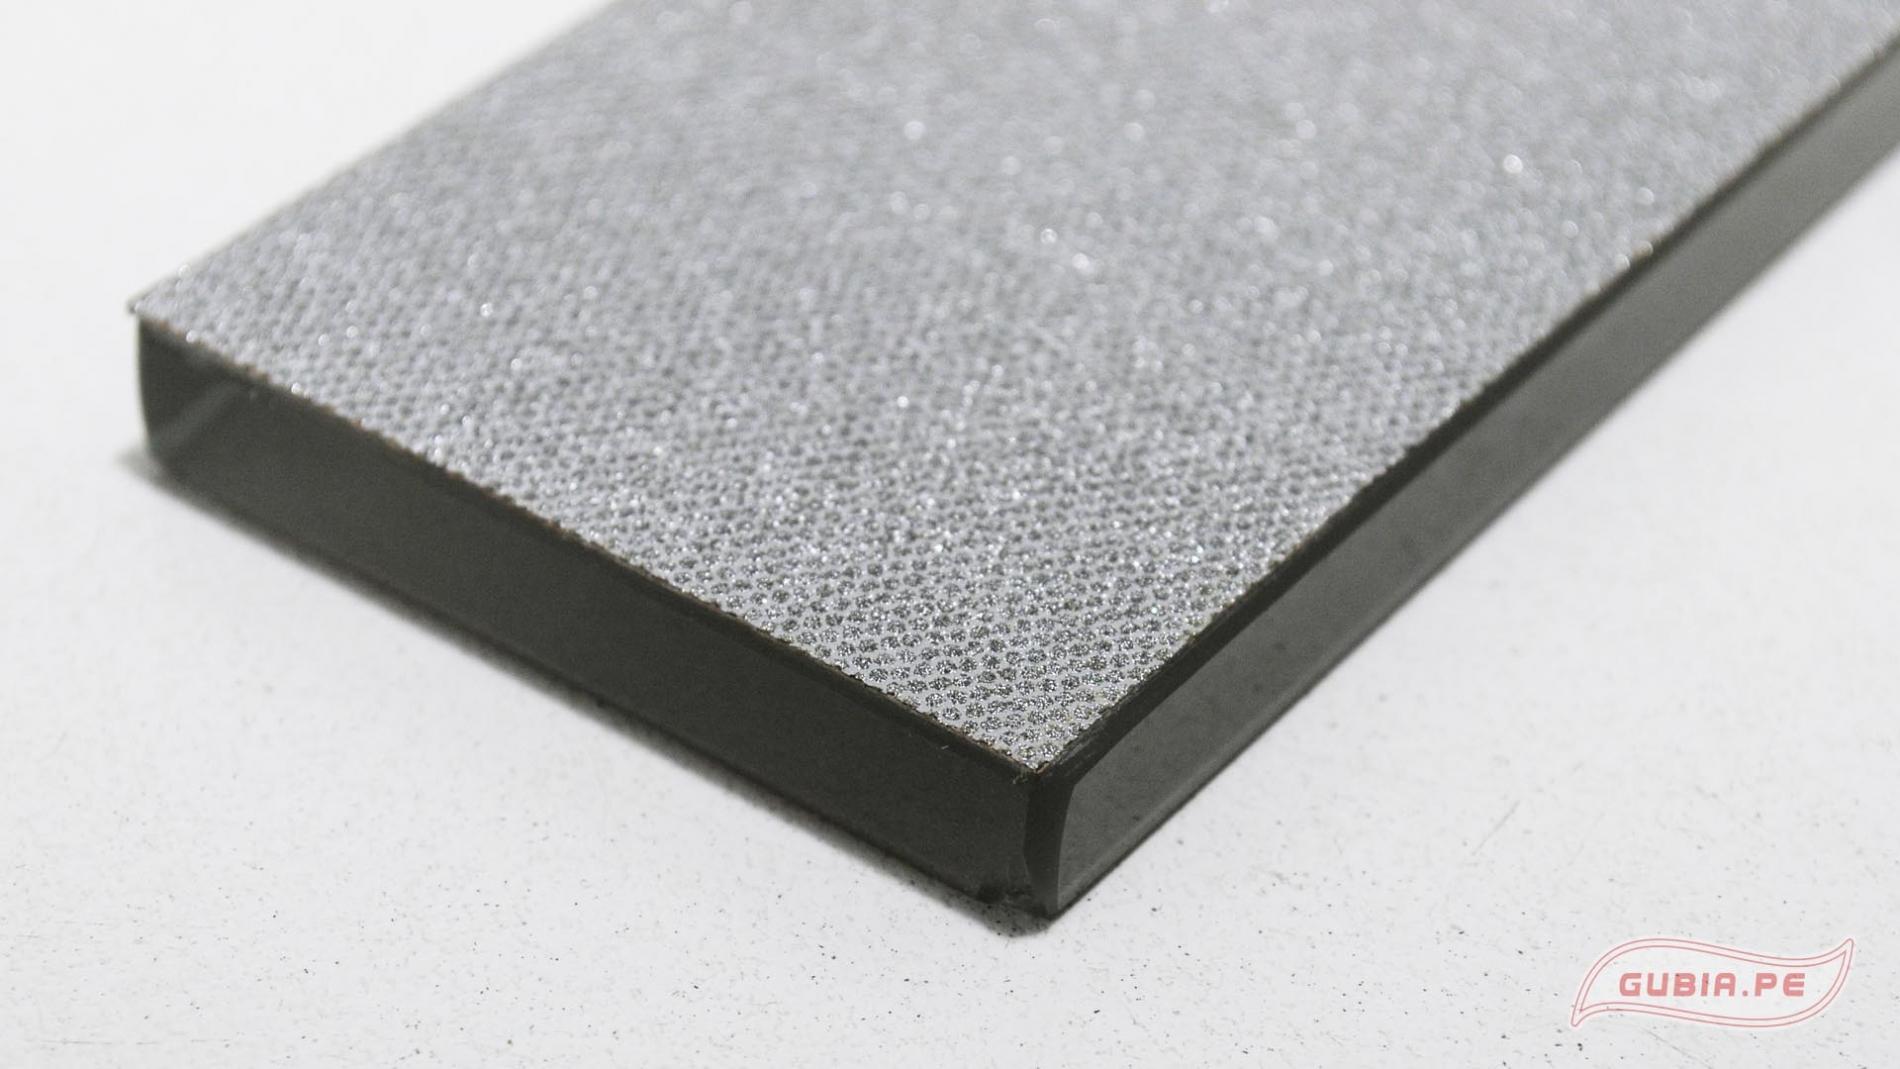 AtomaS140-Aplanador de piedras diamantado 100x50 grano 140 AtomaS140-max-3.